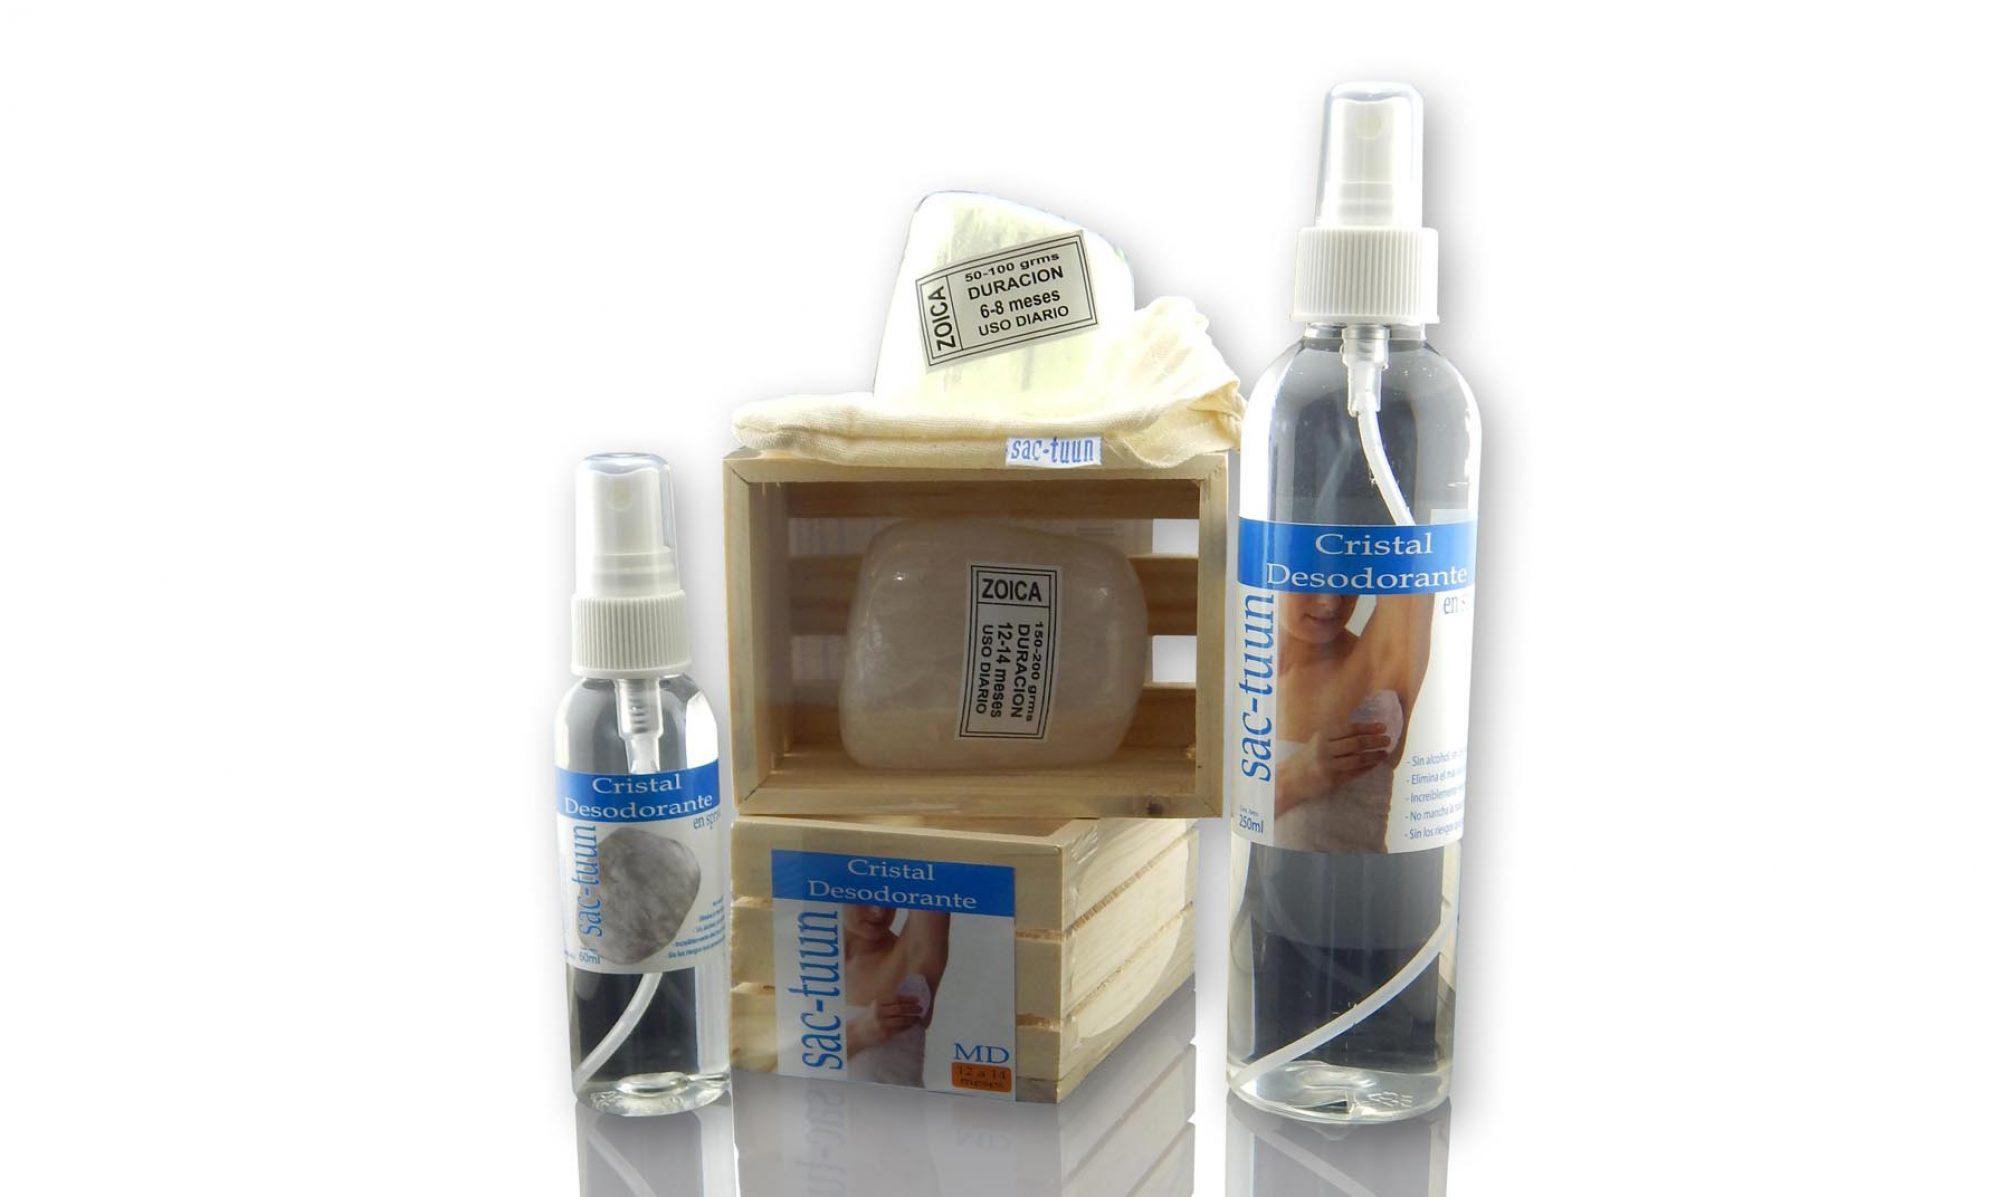 Cristal Desodorante Sac-Tuun